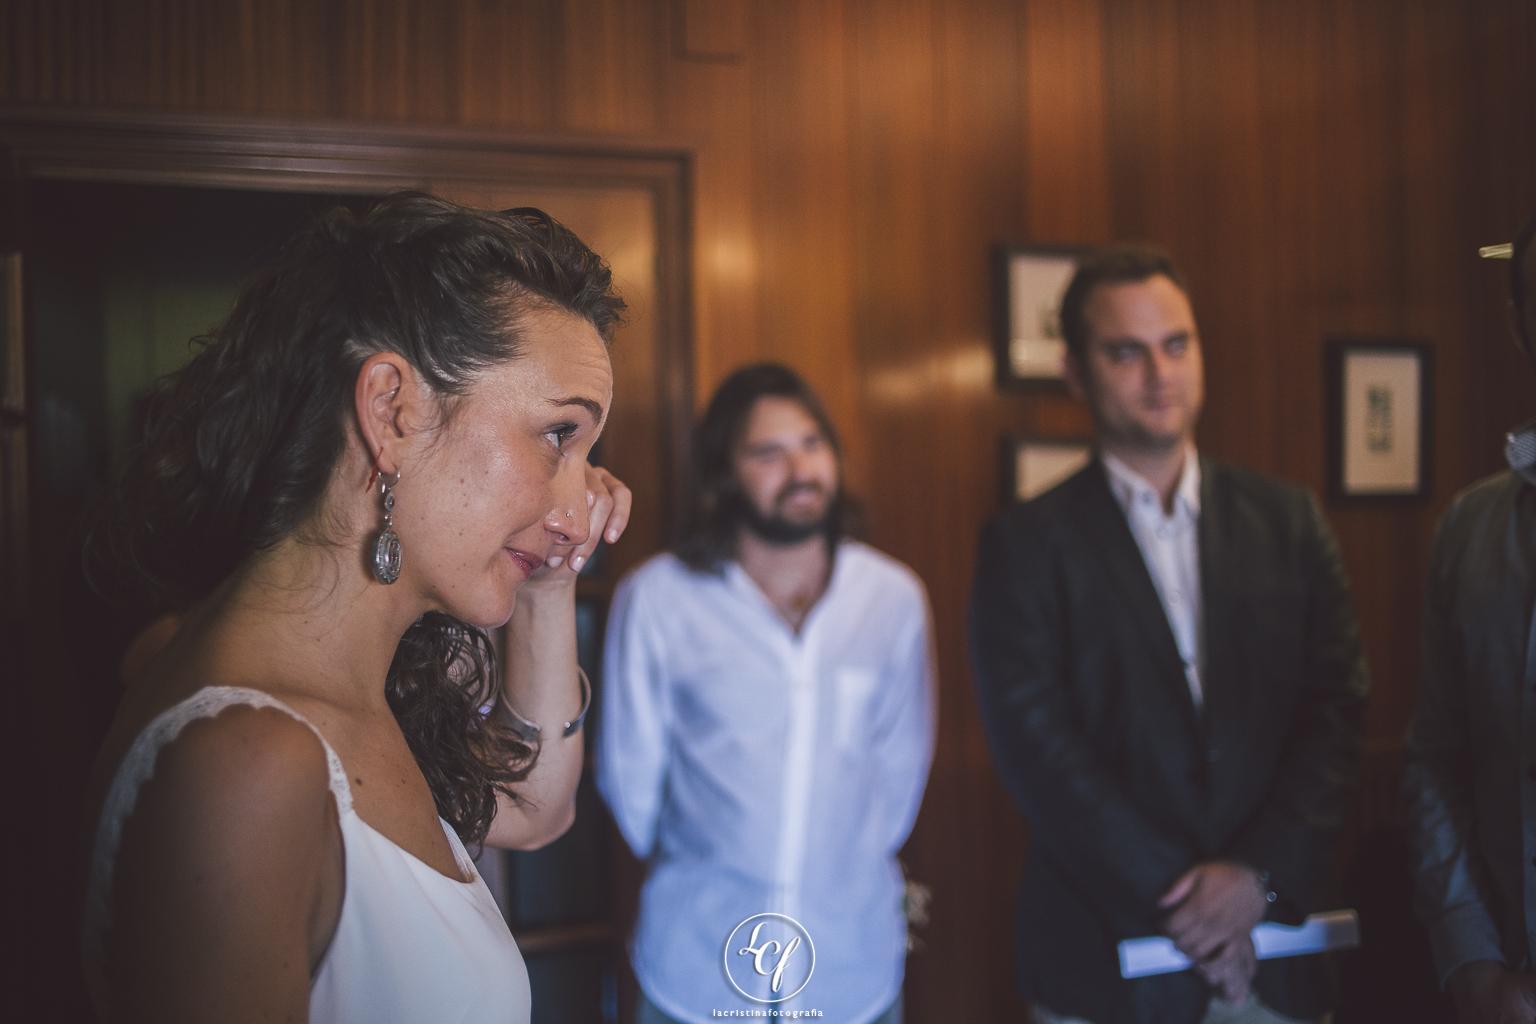 fotógrafo de bodas :: fotografía de bodas :: bodas con encanto :: bodas en el campo :: bodas en masía :: Masía Pou de la Vinya Olivella :: Boda vintage :: Boda al atardecer